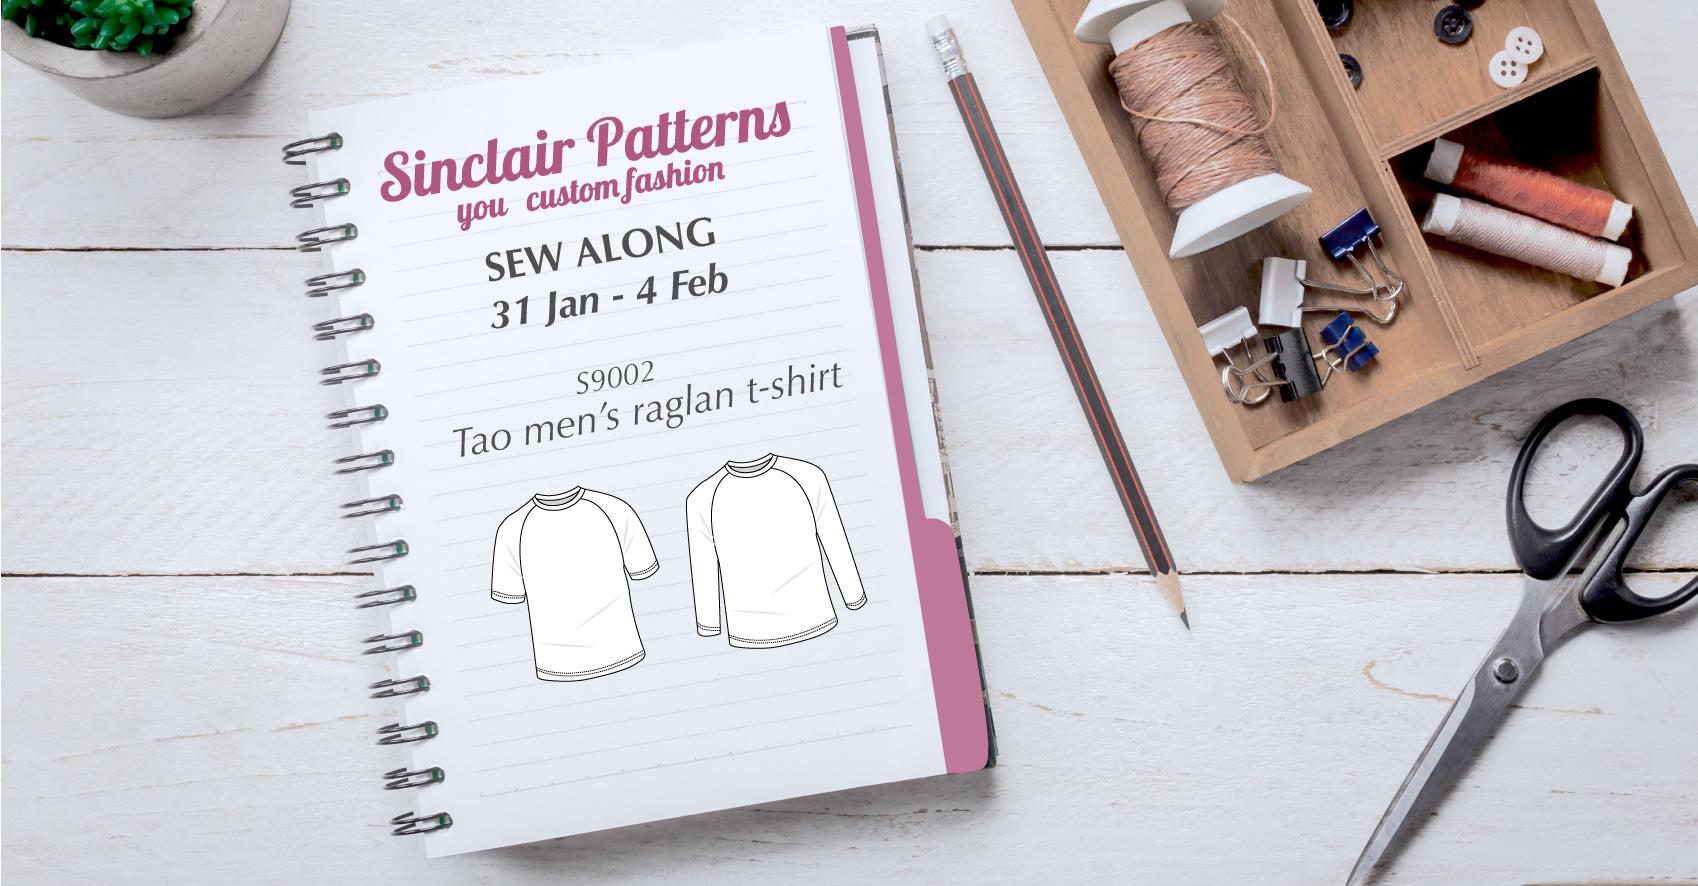 Sinclair sewing patterns tao mens raglan sew a long seams sew lo sinclair sewing patterns tao mens raglan sew a long jeuxipadfo Images